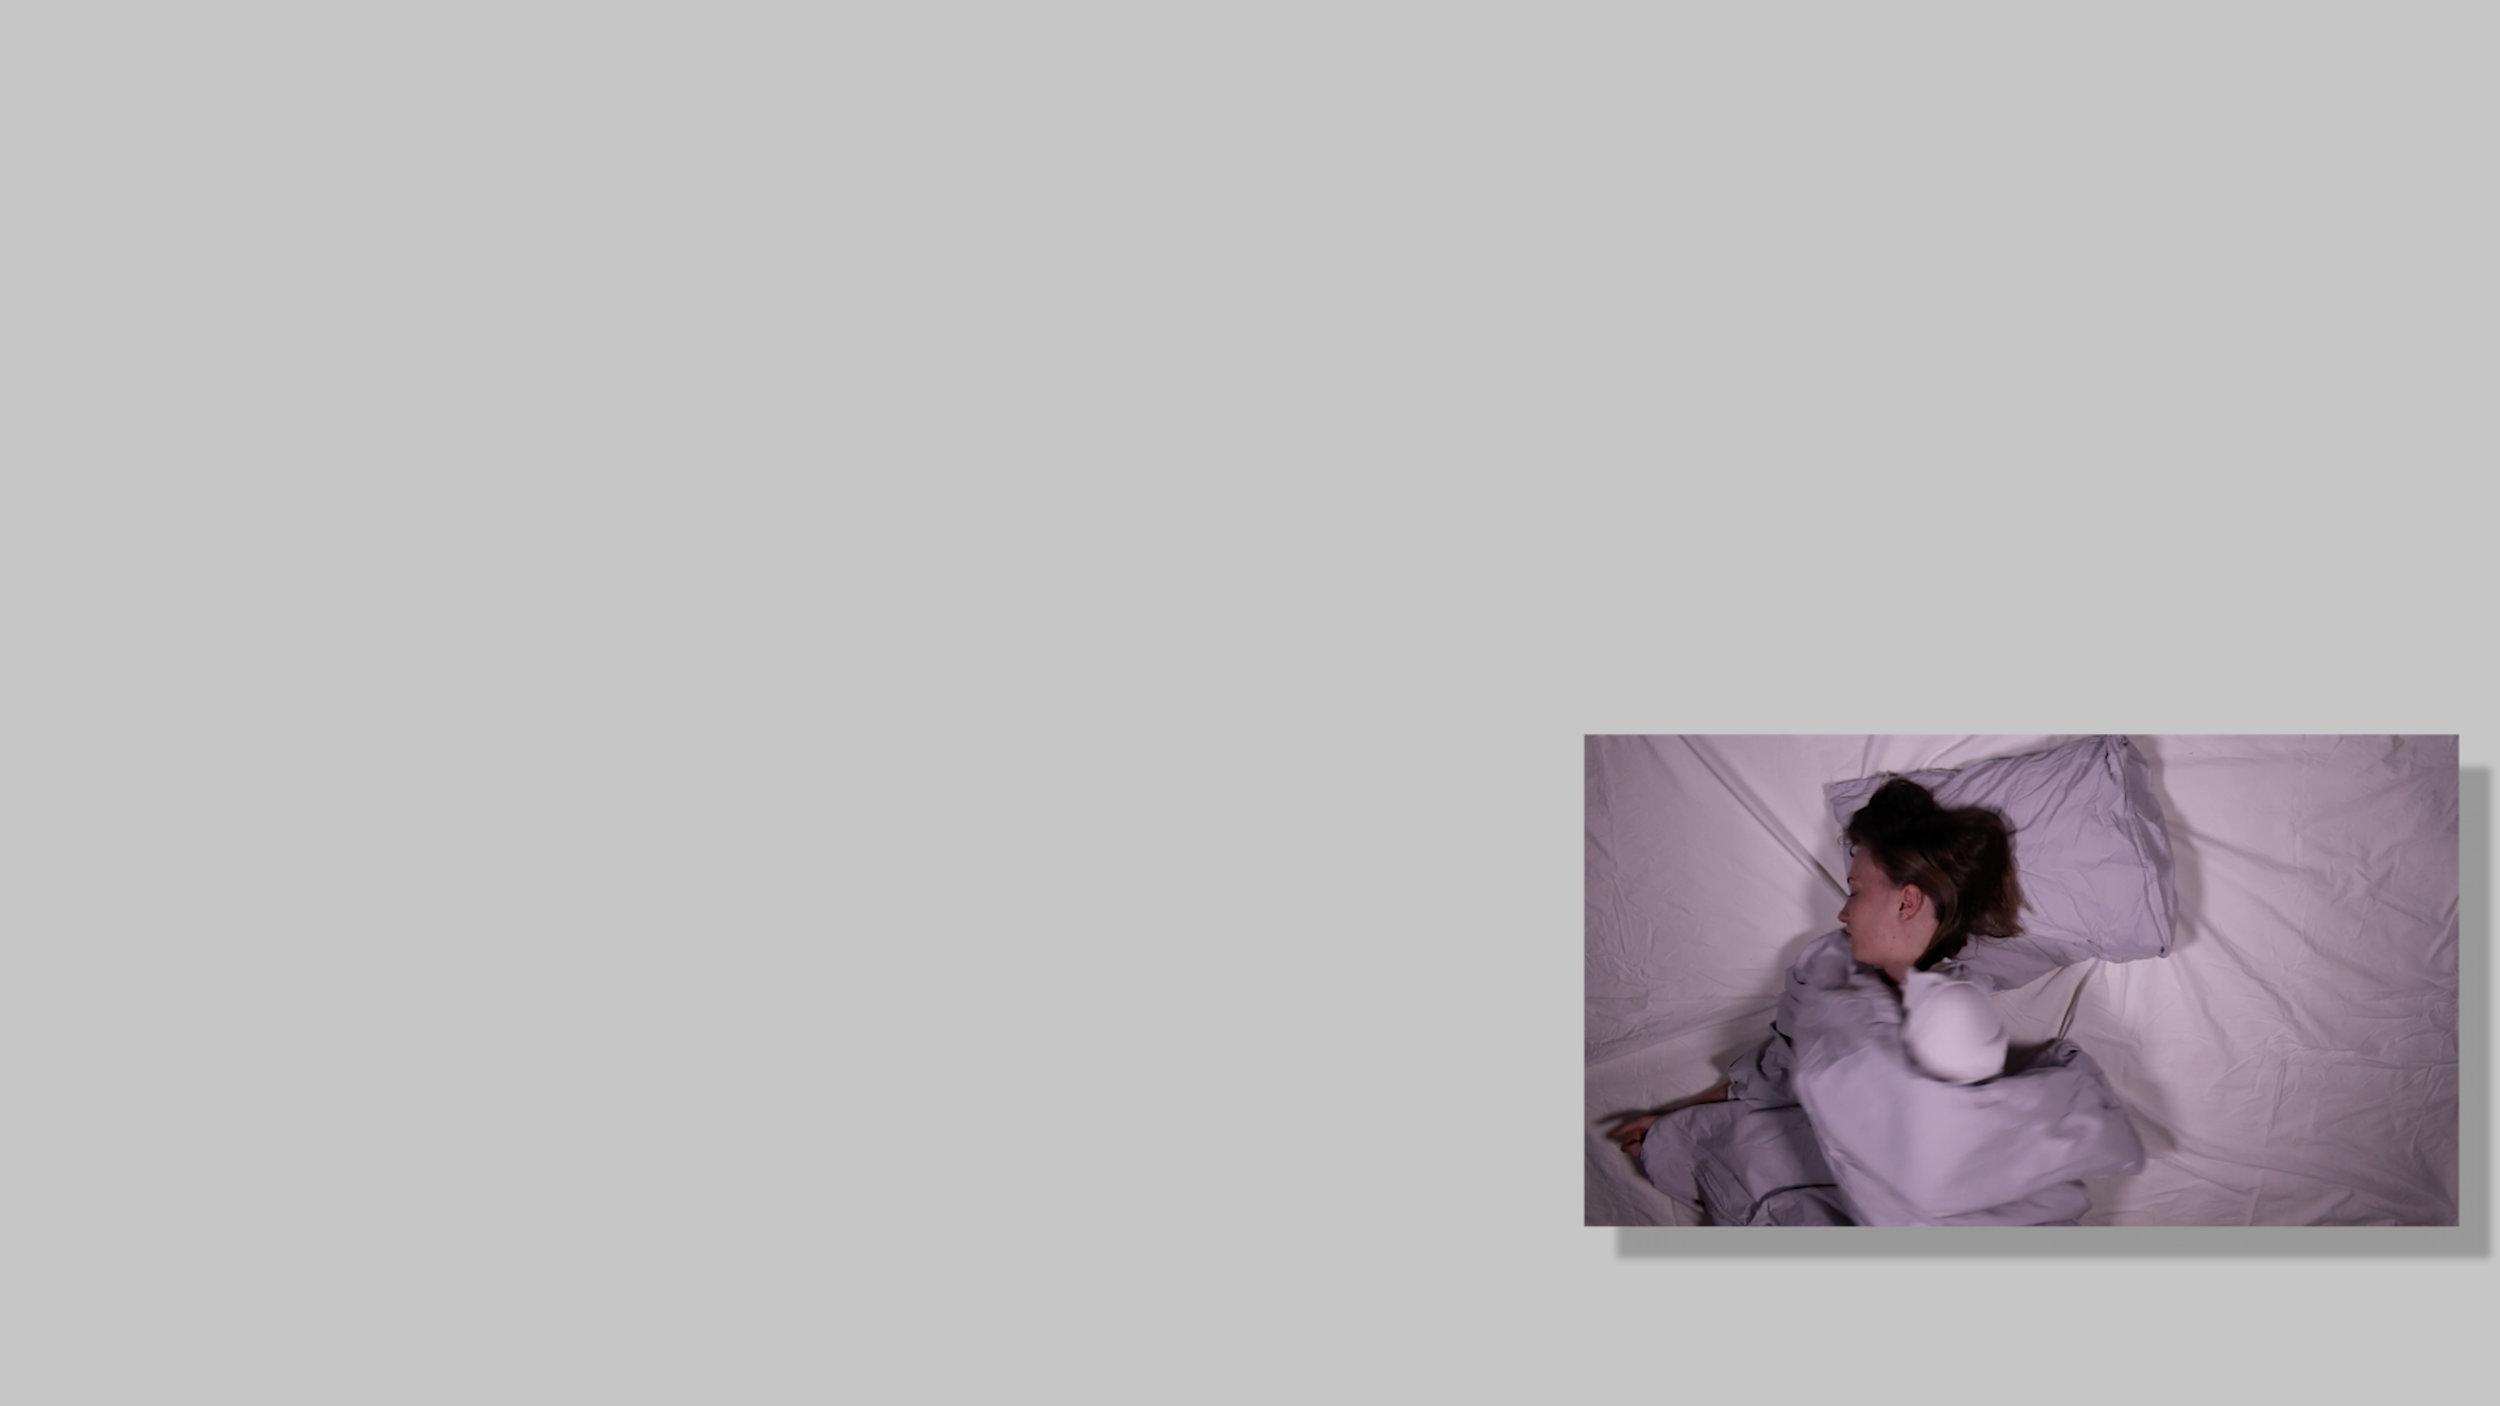 sickleave3_press_300dpi.jpg